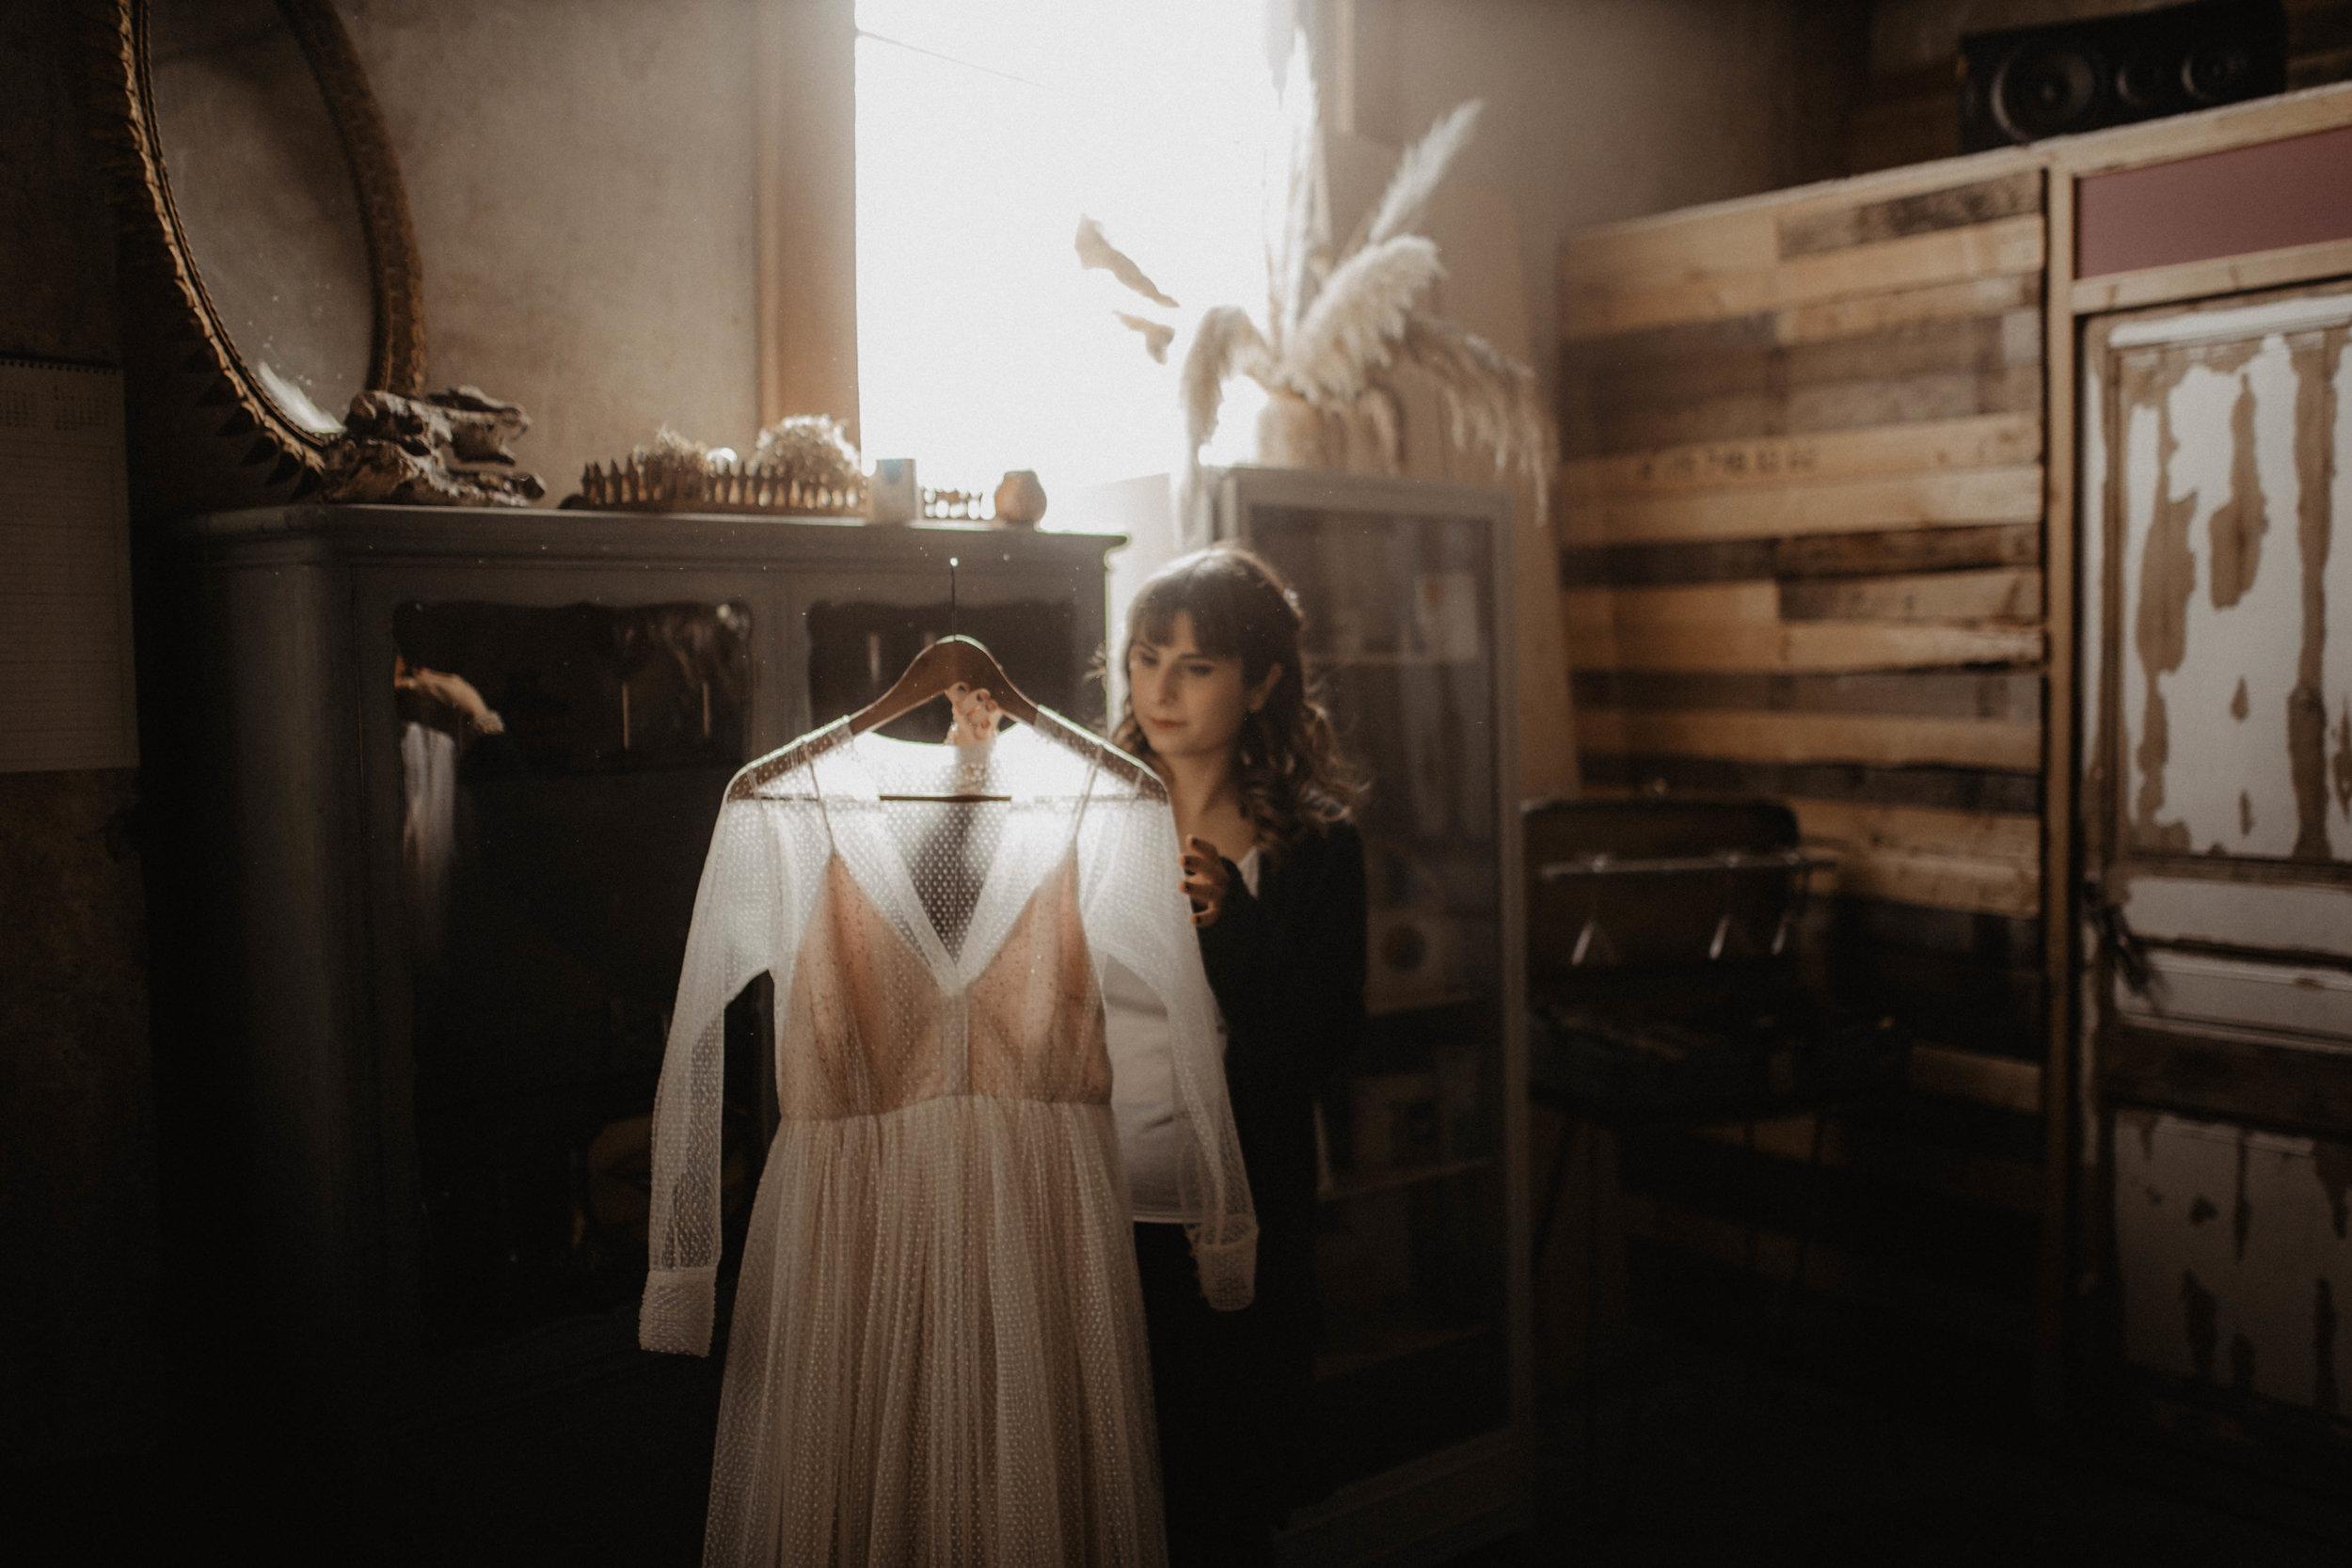 thenortherngirlphotography-photography-weddingphotography-couple-bodasconestilo-bodasenbarcelona-martadavid-139.jpg